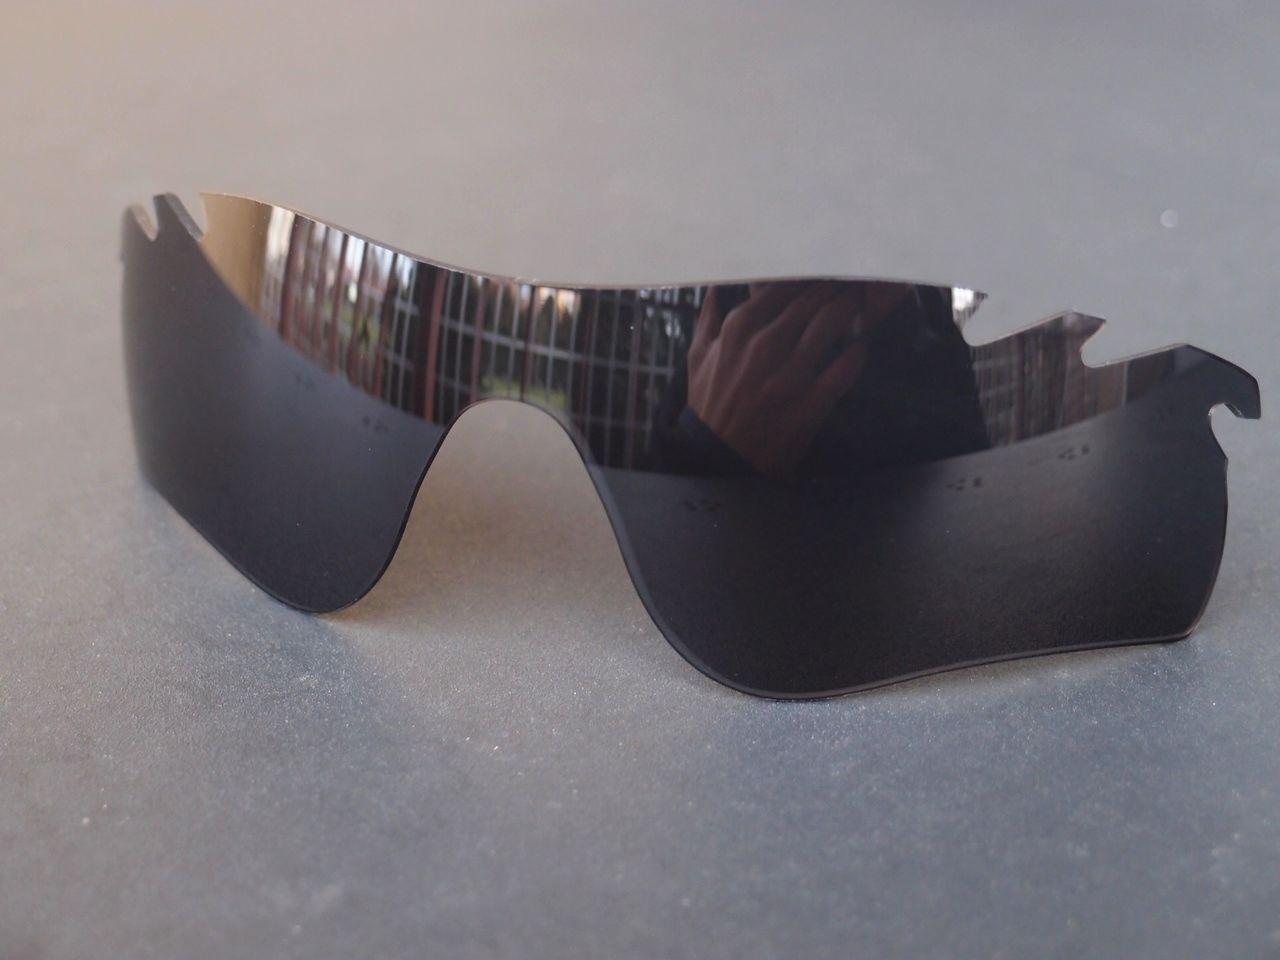 Radarlock Grey Path vented lens - s-l1600.jpg